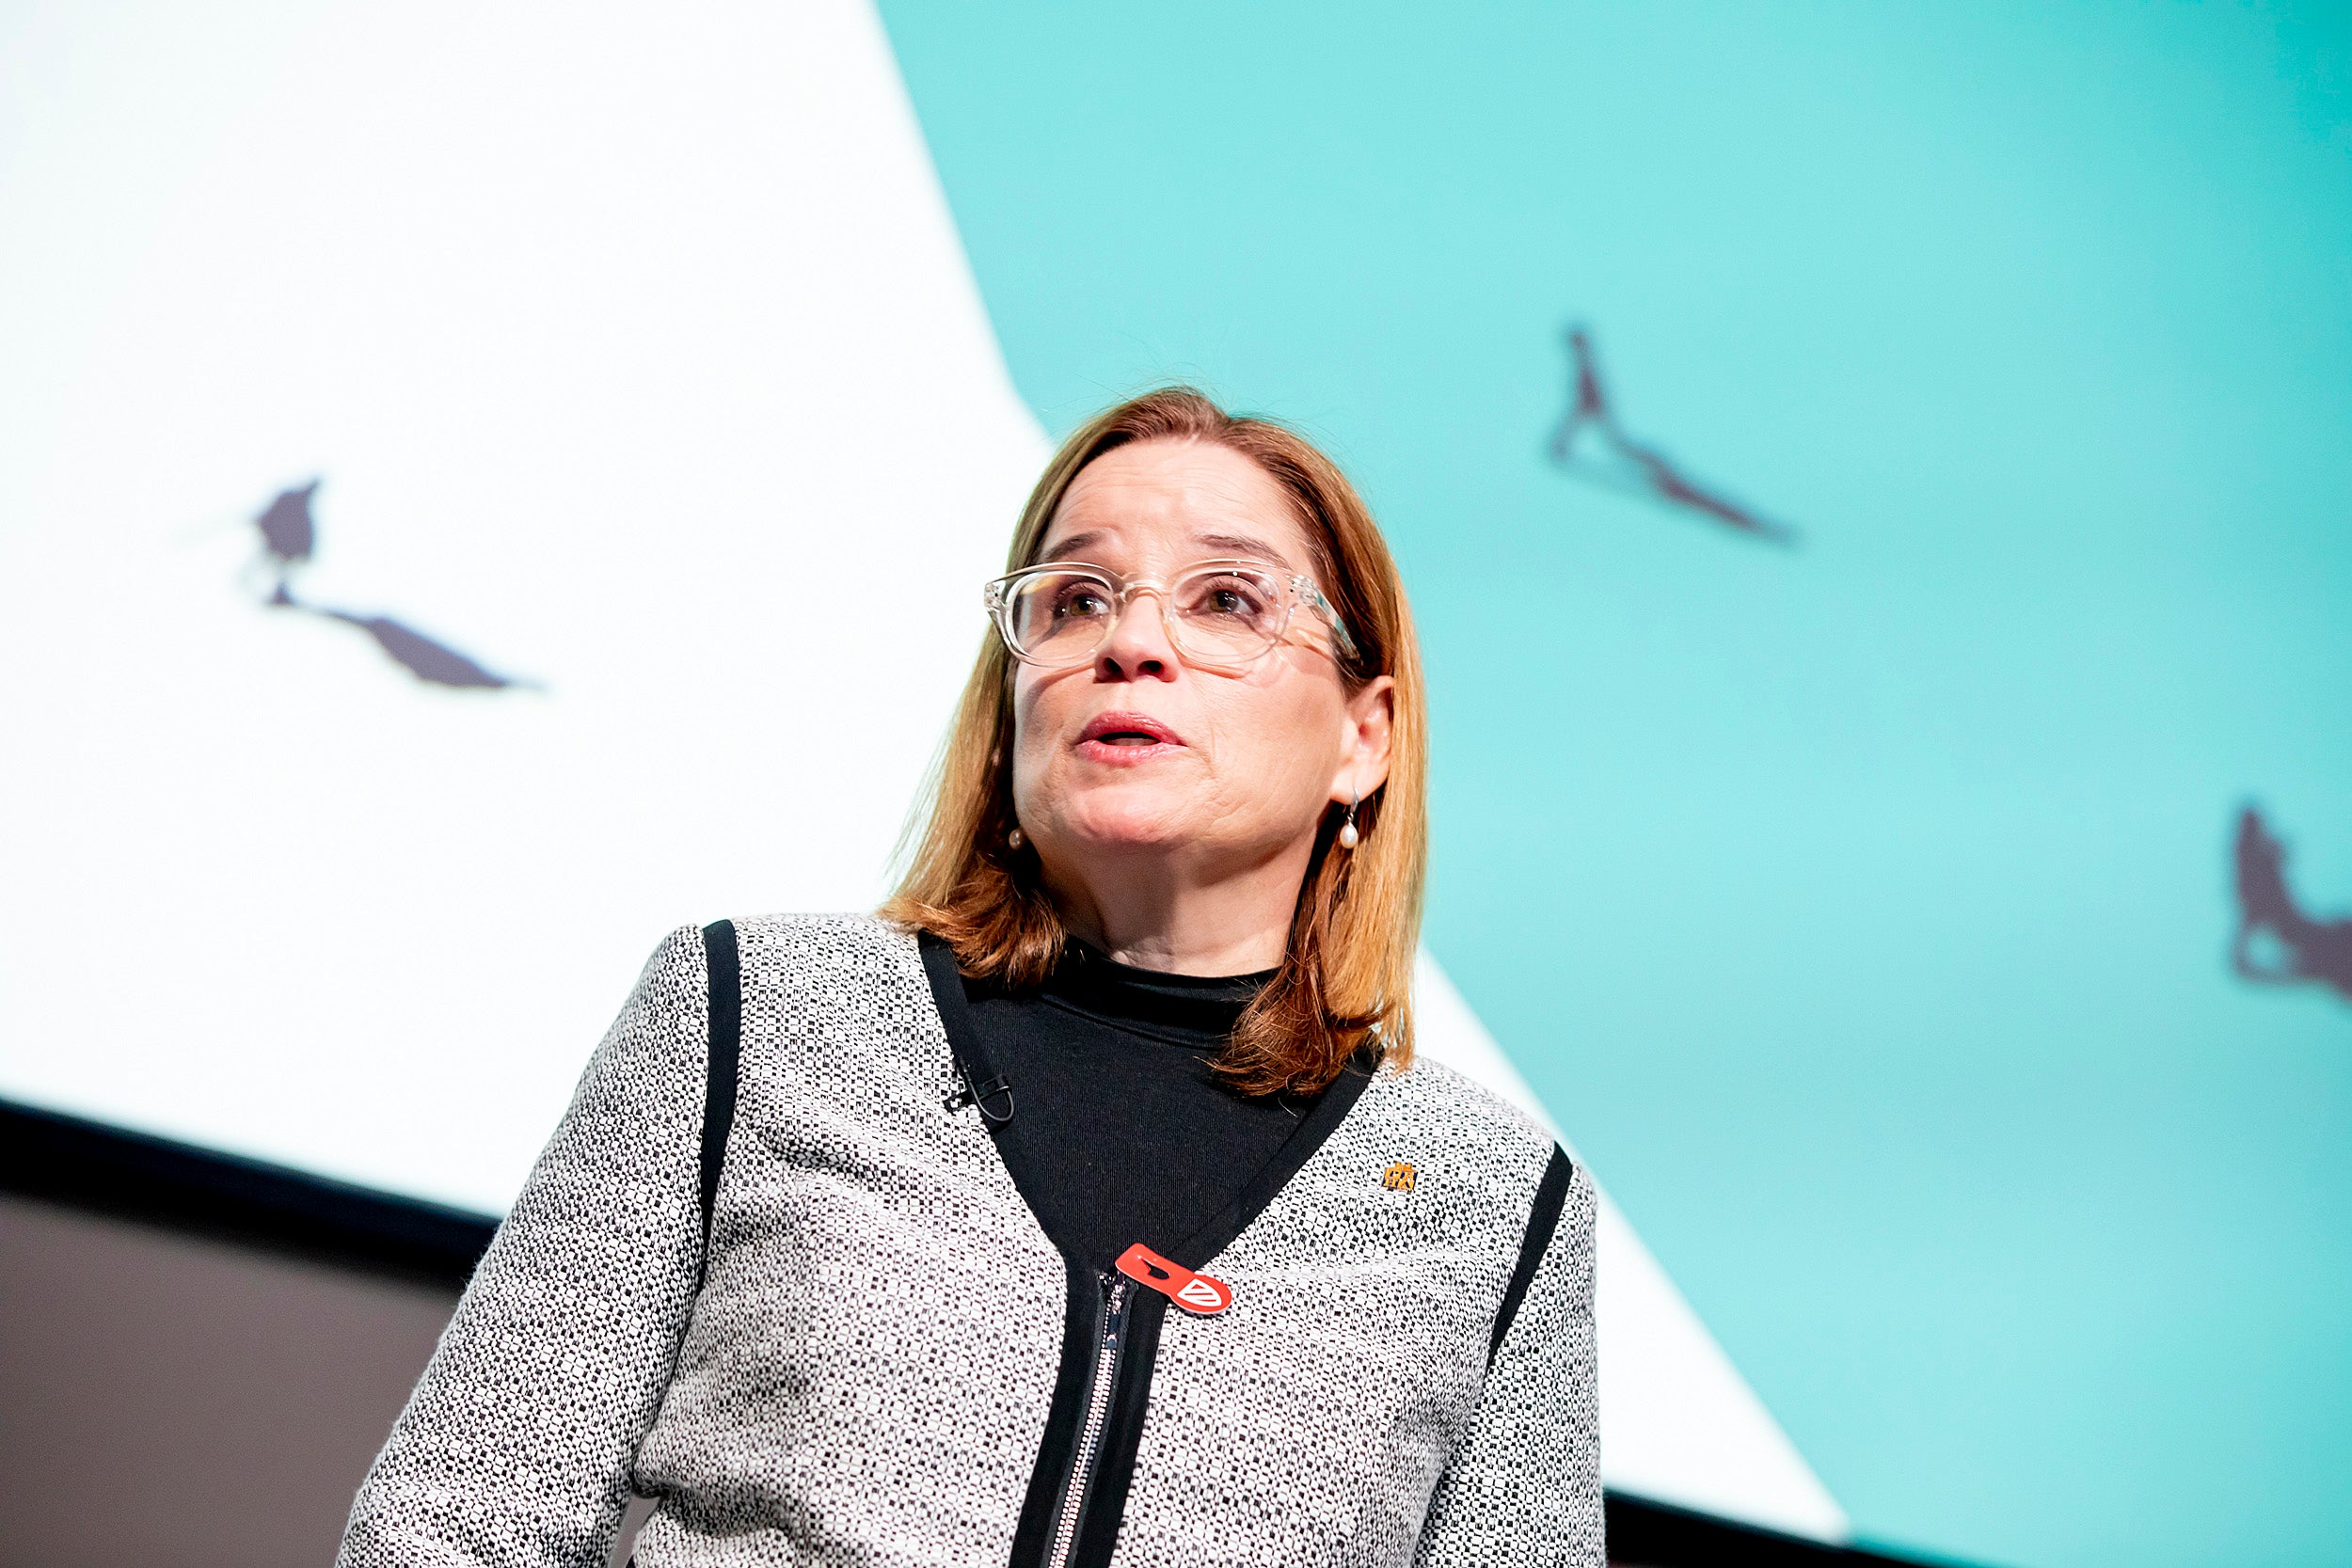 Carmen Yulín Cruz, mayor of San Juan, Puerto Rico, speaks at a Radcliffe conference about citizenship.